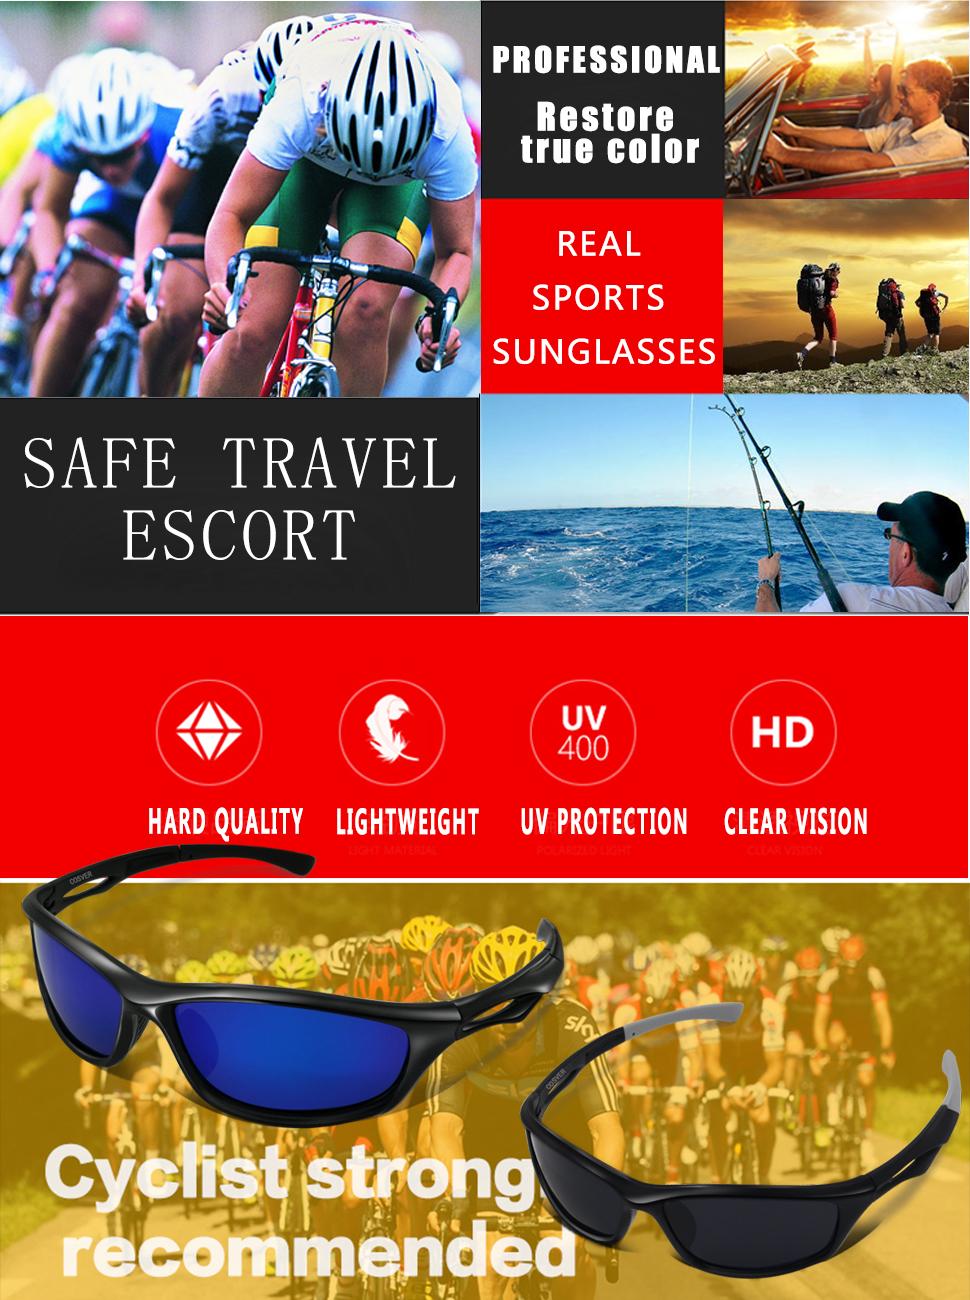 Amazon.com: COSVER Polarized Sports Sunglasses for Men Women Cycling ...